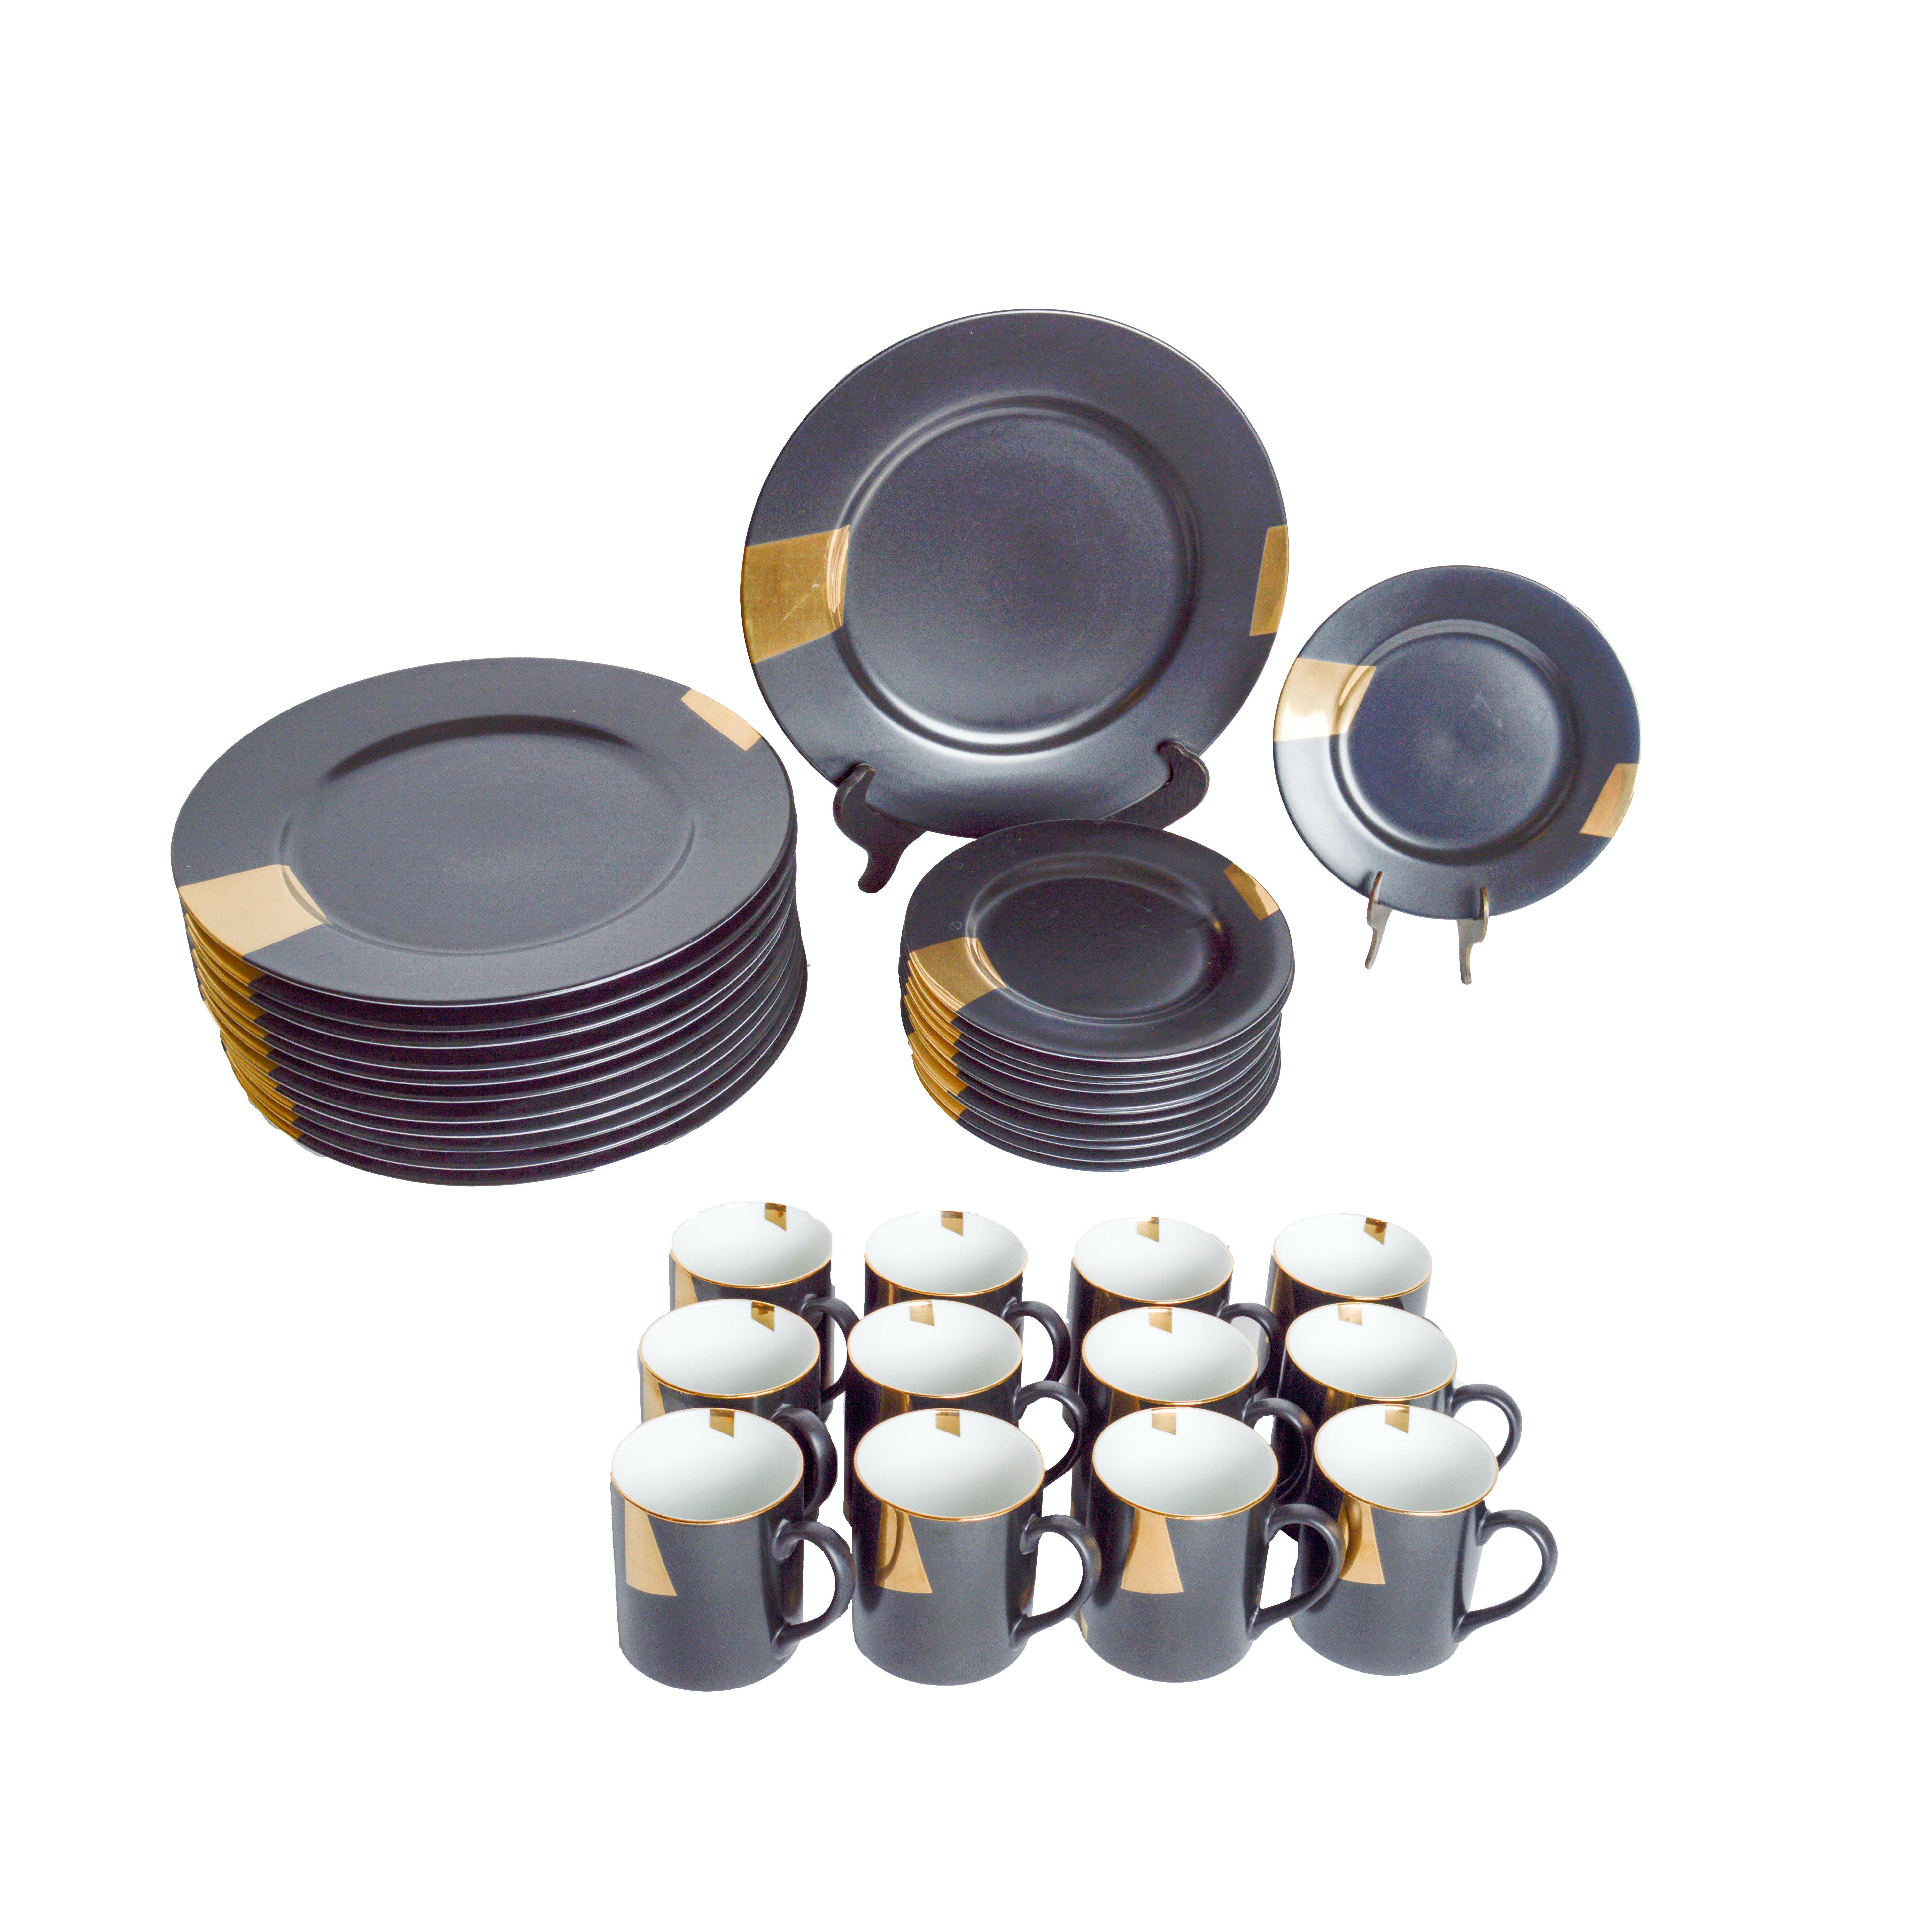 Taitu San Marco Gold Geometric Dinnerware Set ...  sc 1 st  EBTH.com & Taitu San Marco Gold Geometric Dinnerware Set : EBTH